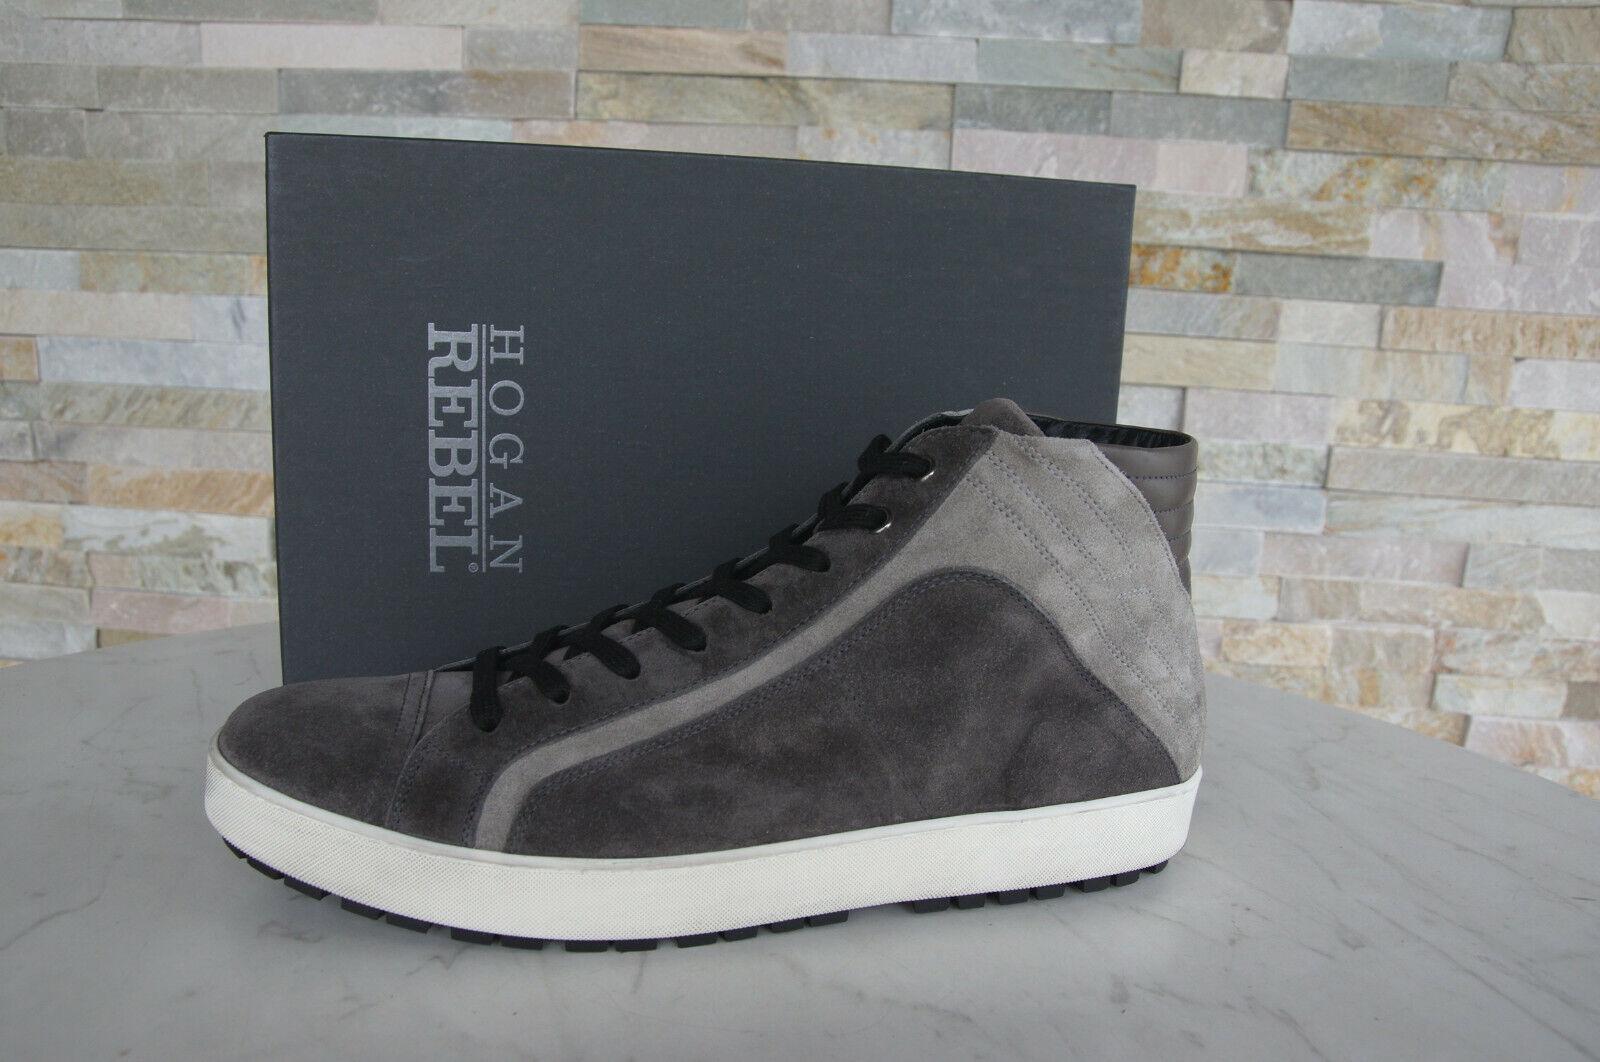 HOGAN REBEL 44,5 10,5 High Top scarpe da ginnastica normalissime Nuovo Scarpe piombo ehemuvp